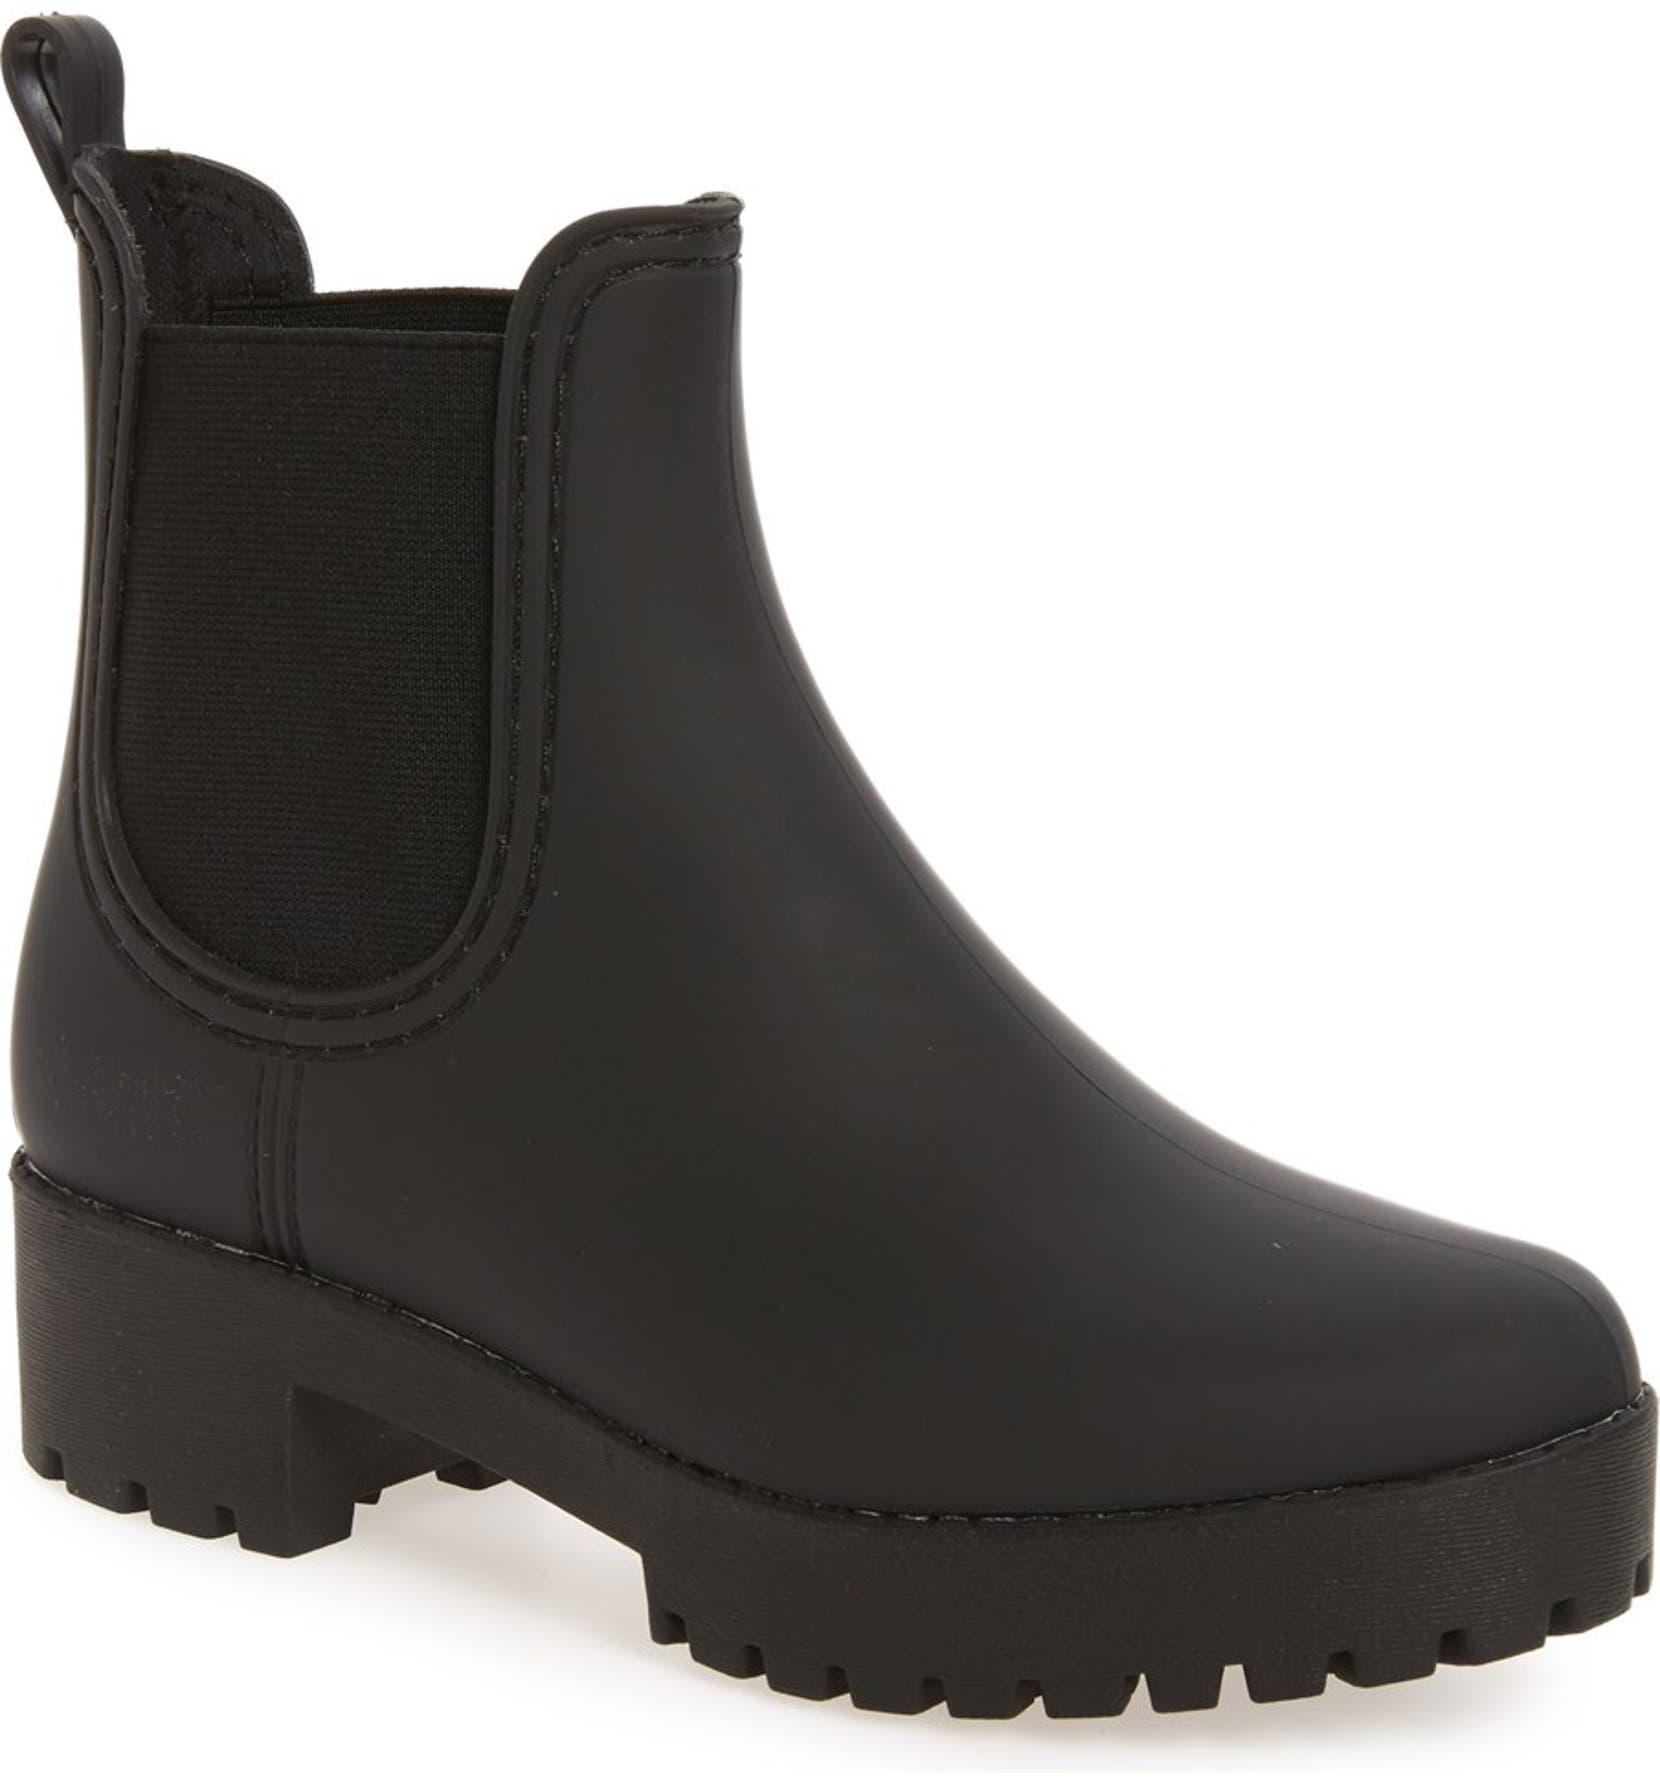 0ed41d6fc47 Jeffrey Campbell Cloudy Waterproof Chelsea Rain Boot (Women)